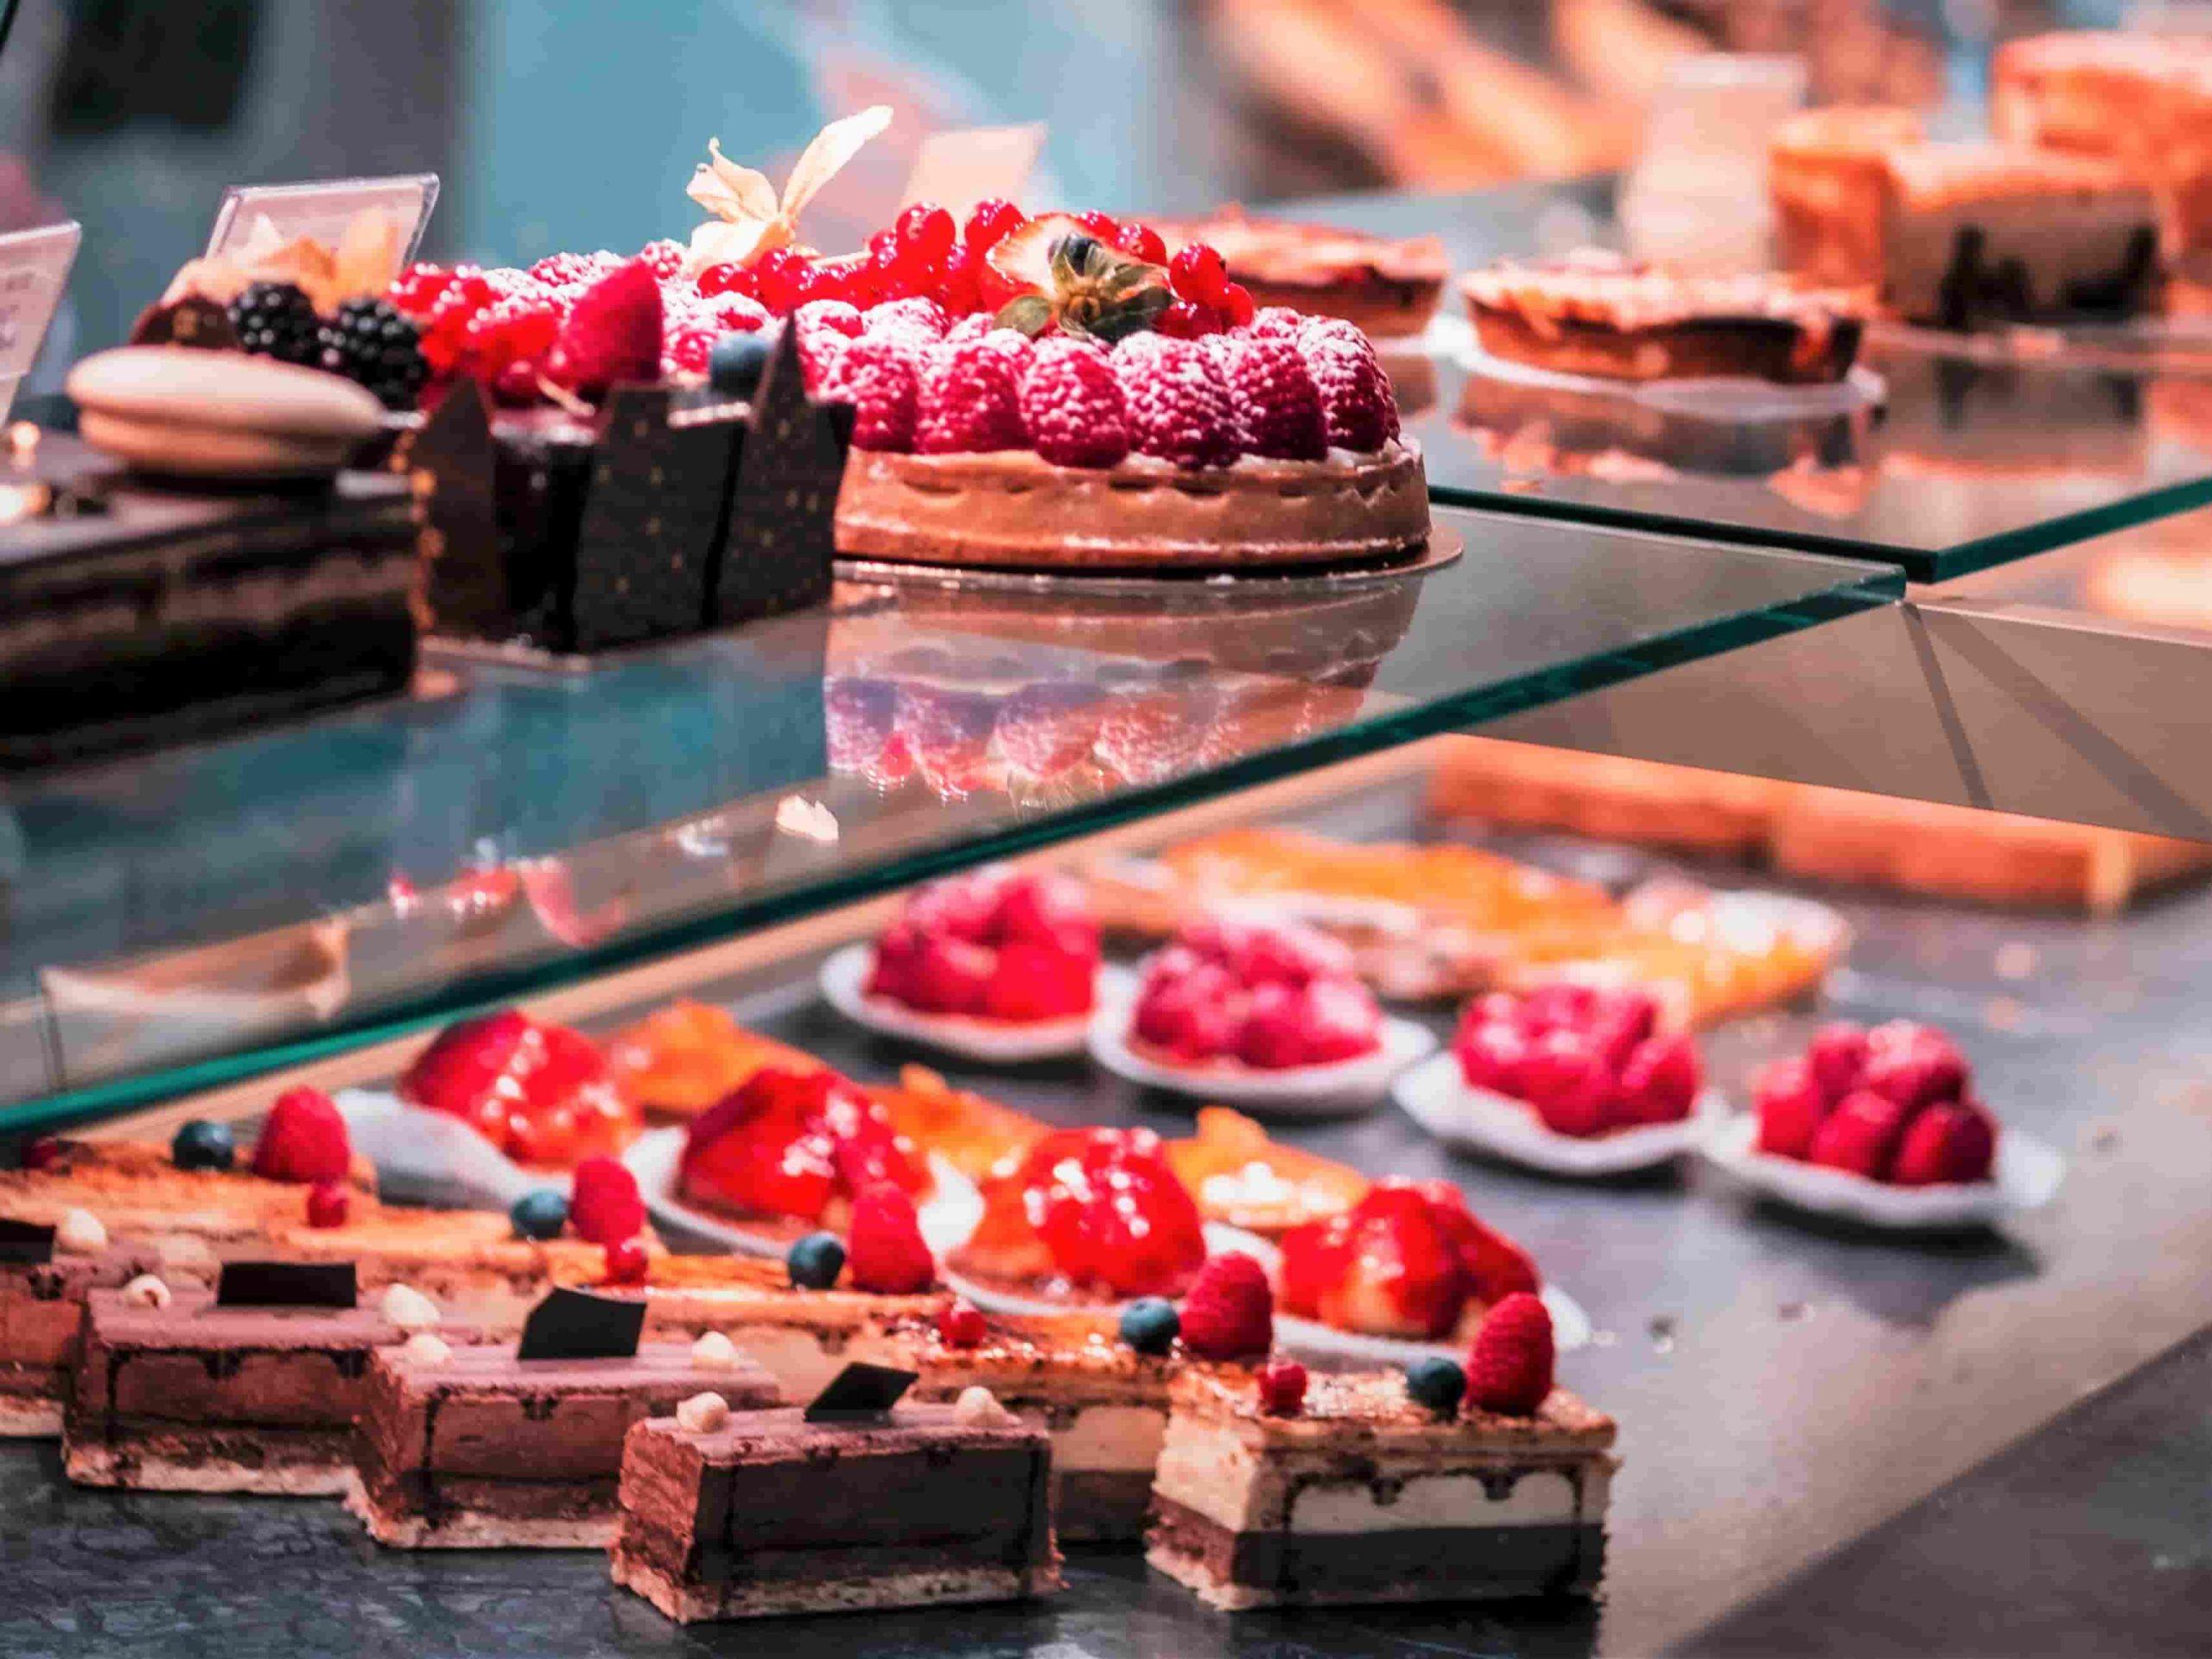 Dessert gallery, bakery, discrimination, gay, employee, lawsuit